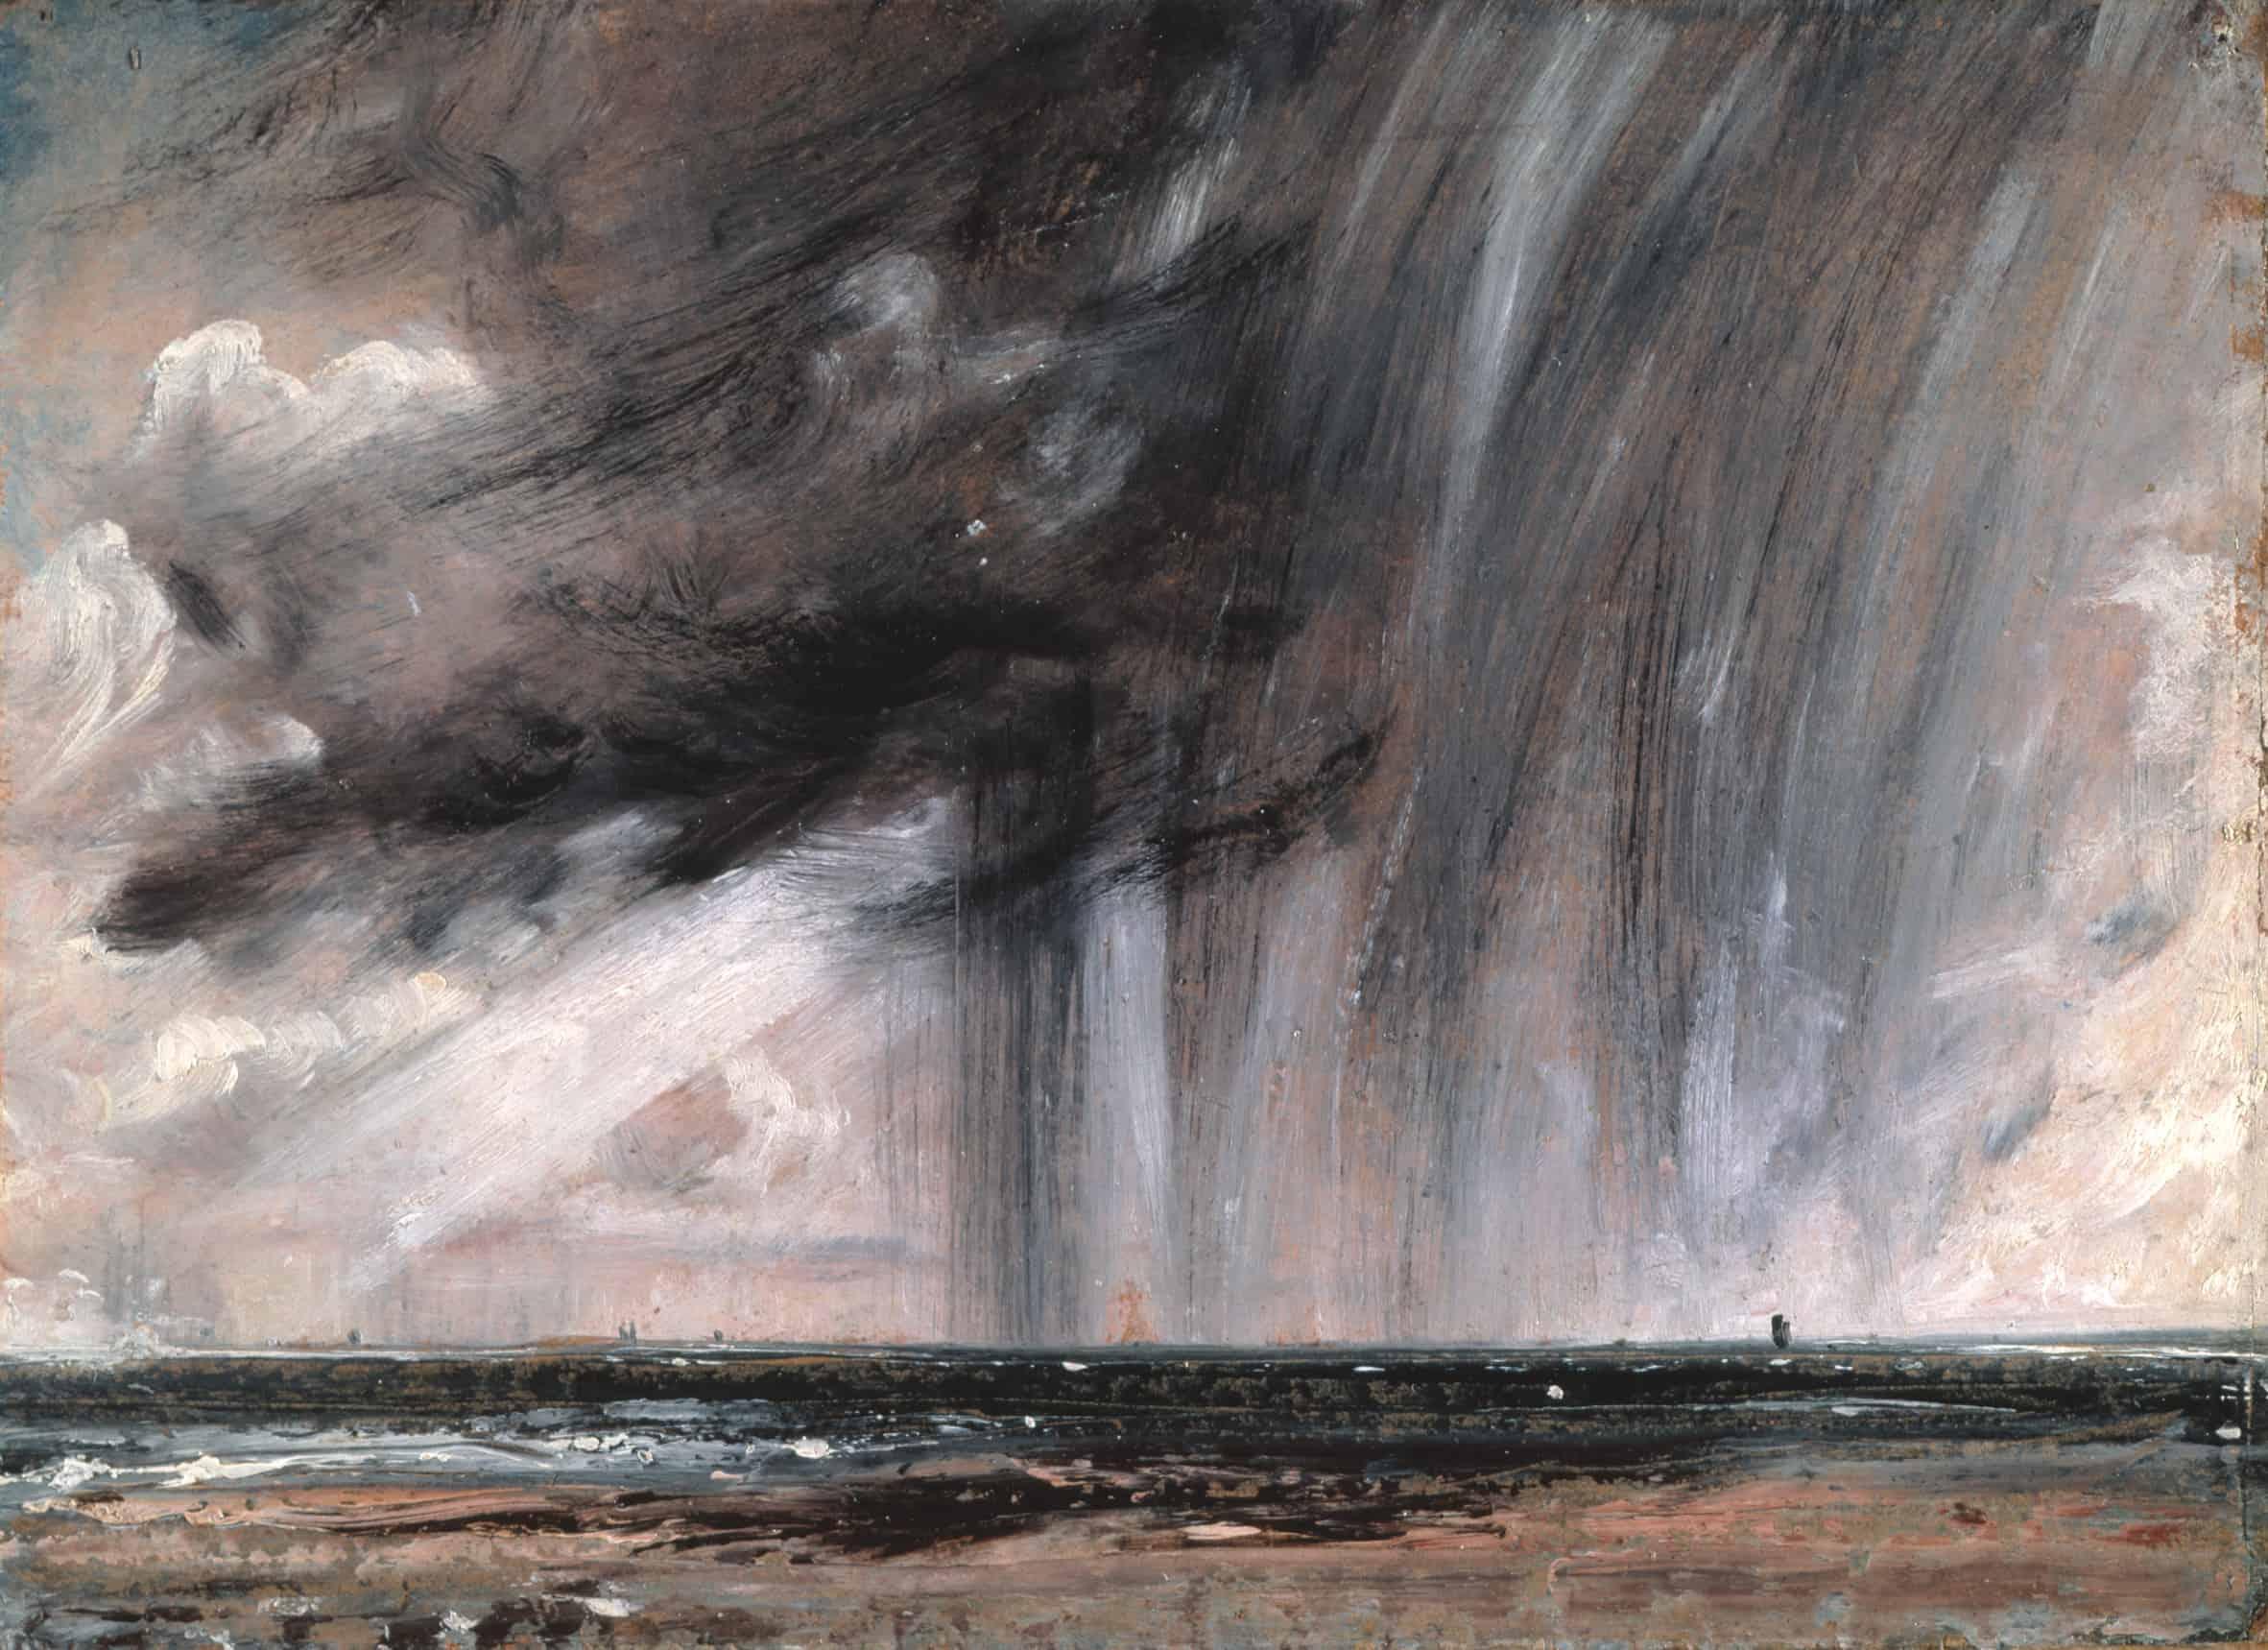 rainstorm over the sea 1828 1 سهراب سبهري - وقع خطوات الماء